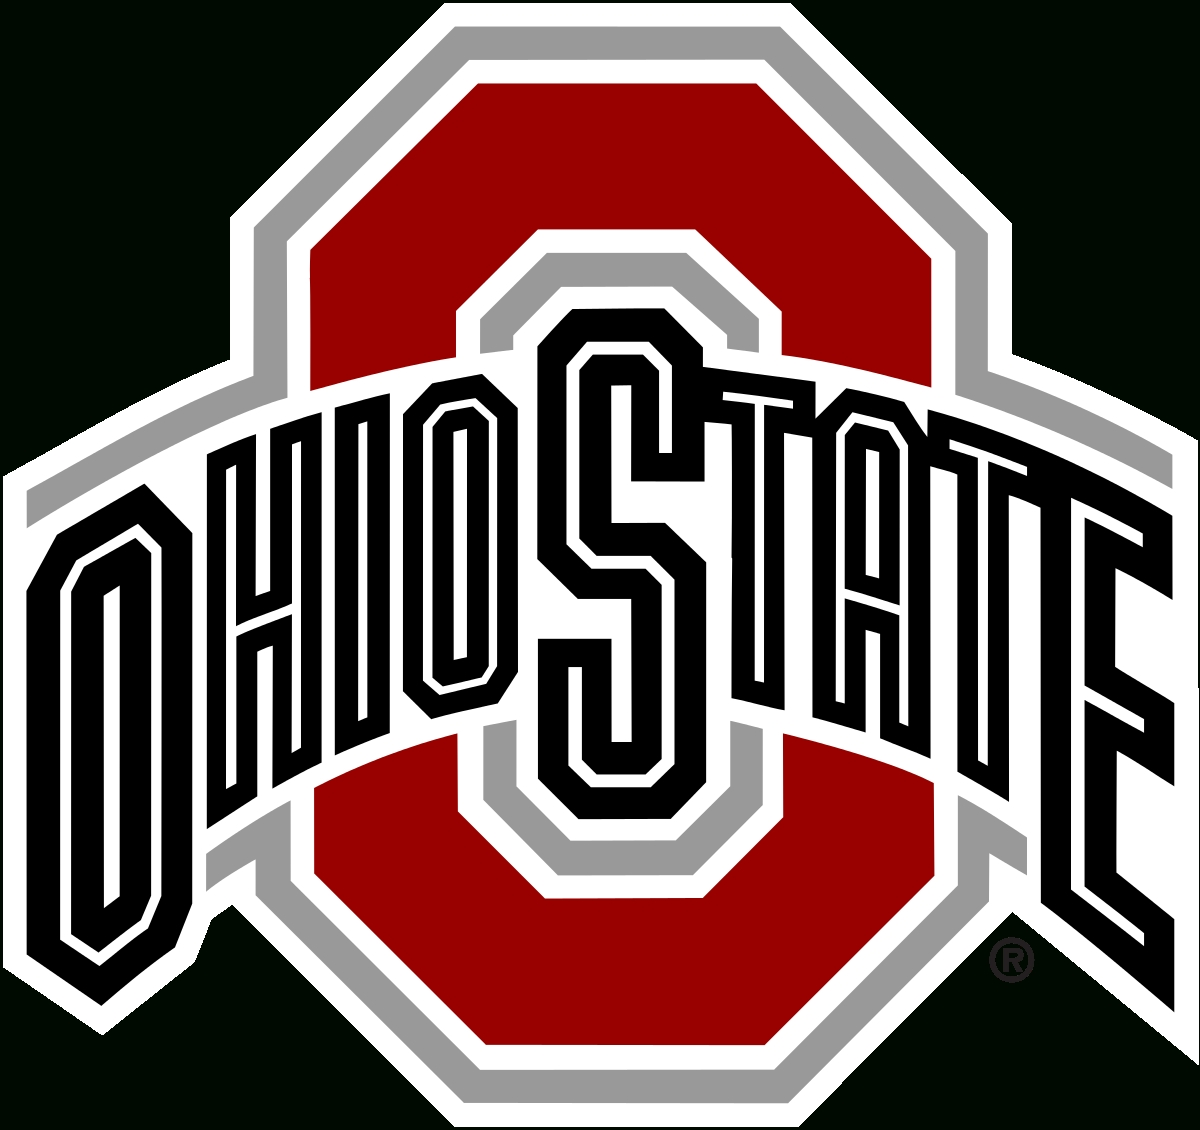 2008 ohio state buckeyes football team - wikipedia